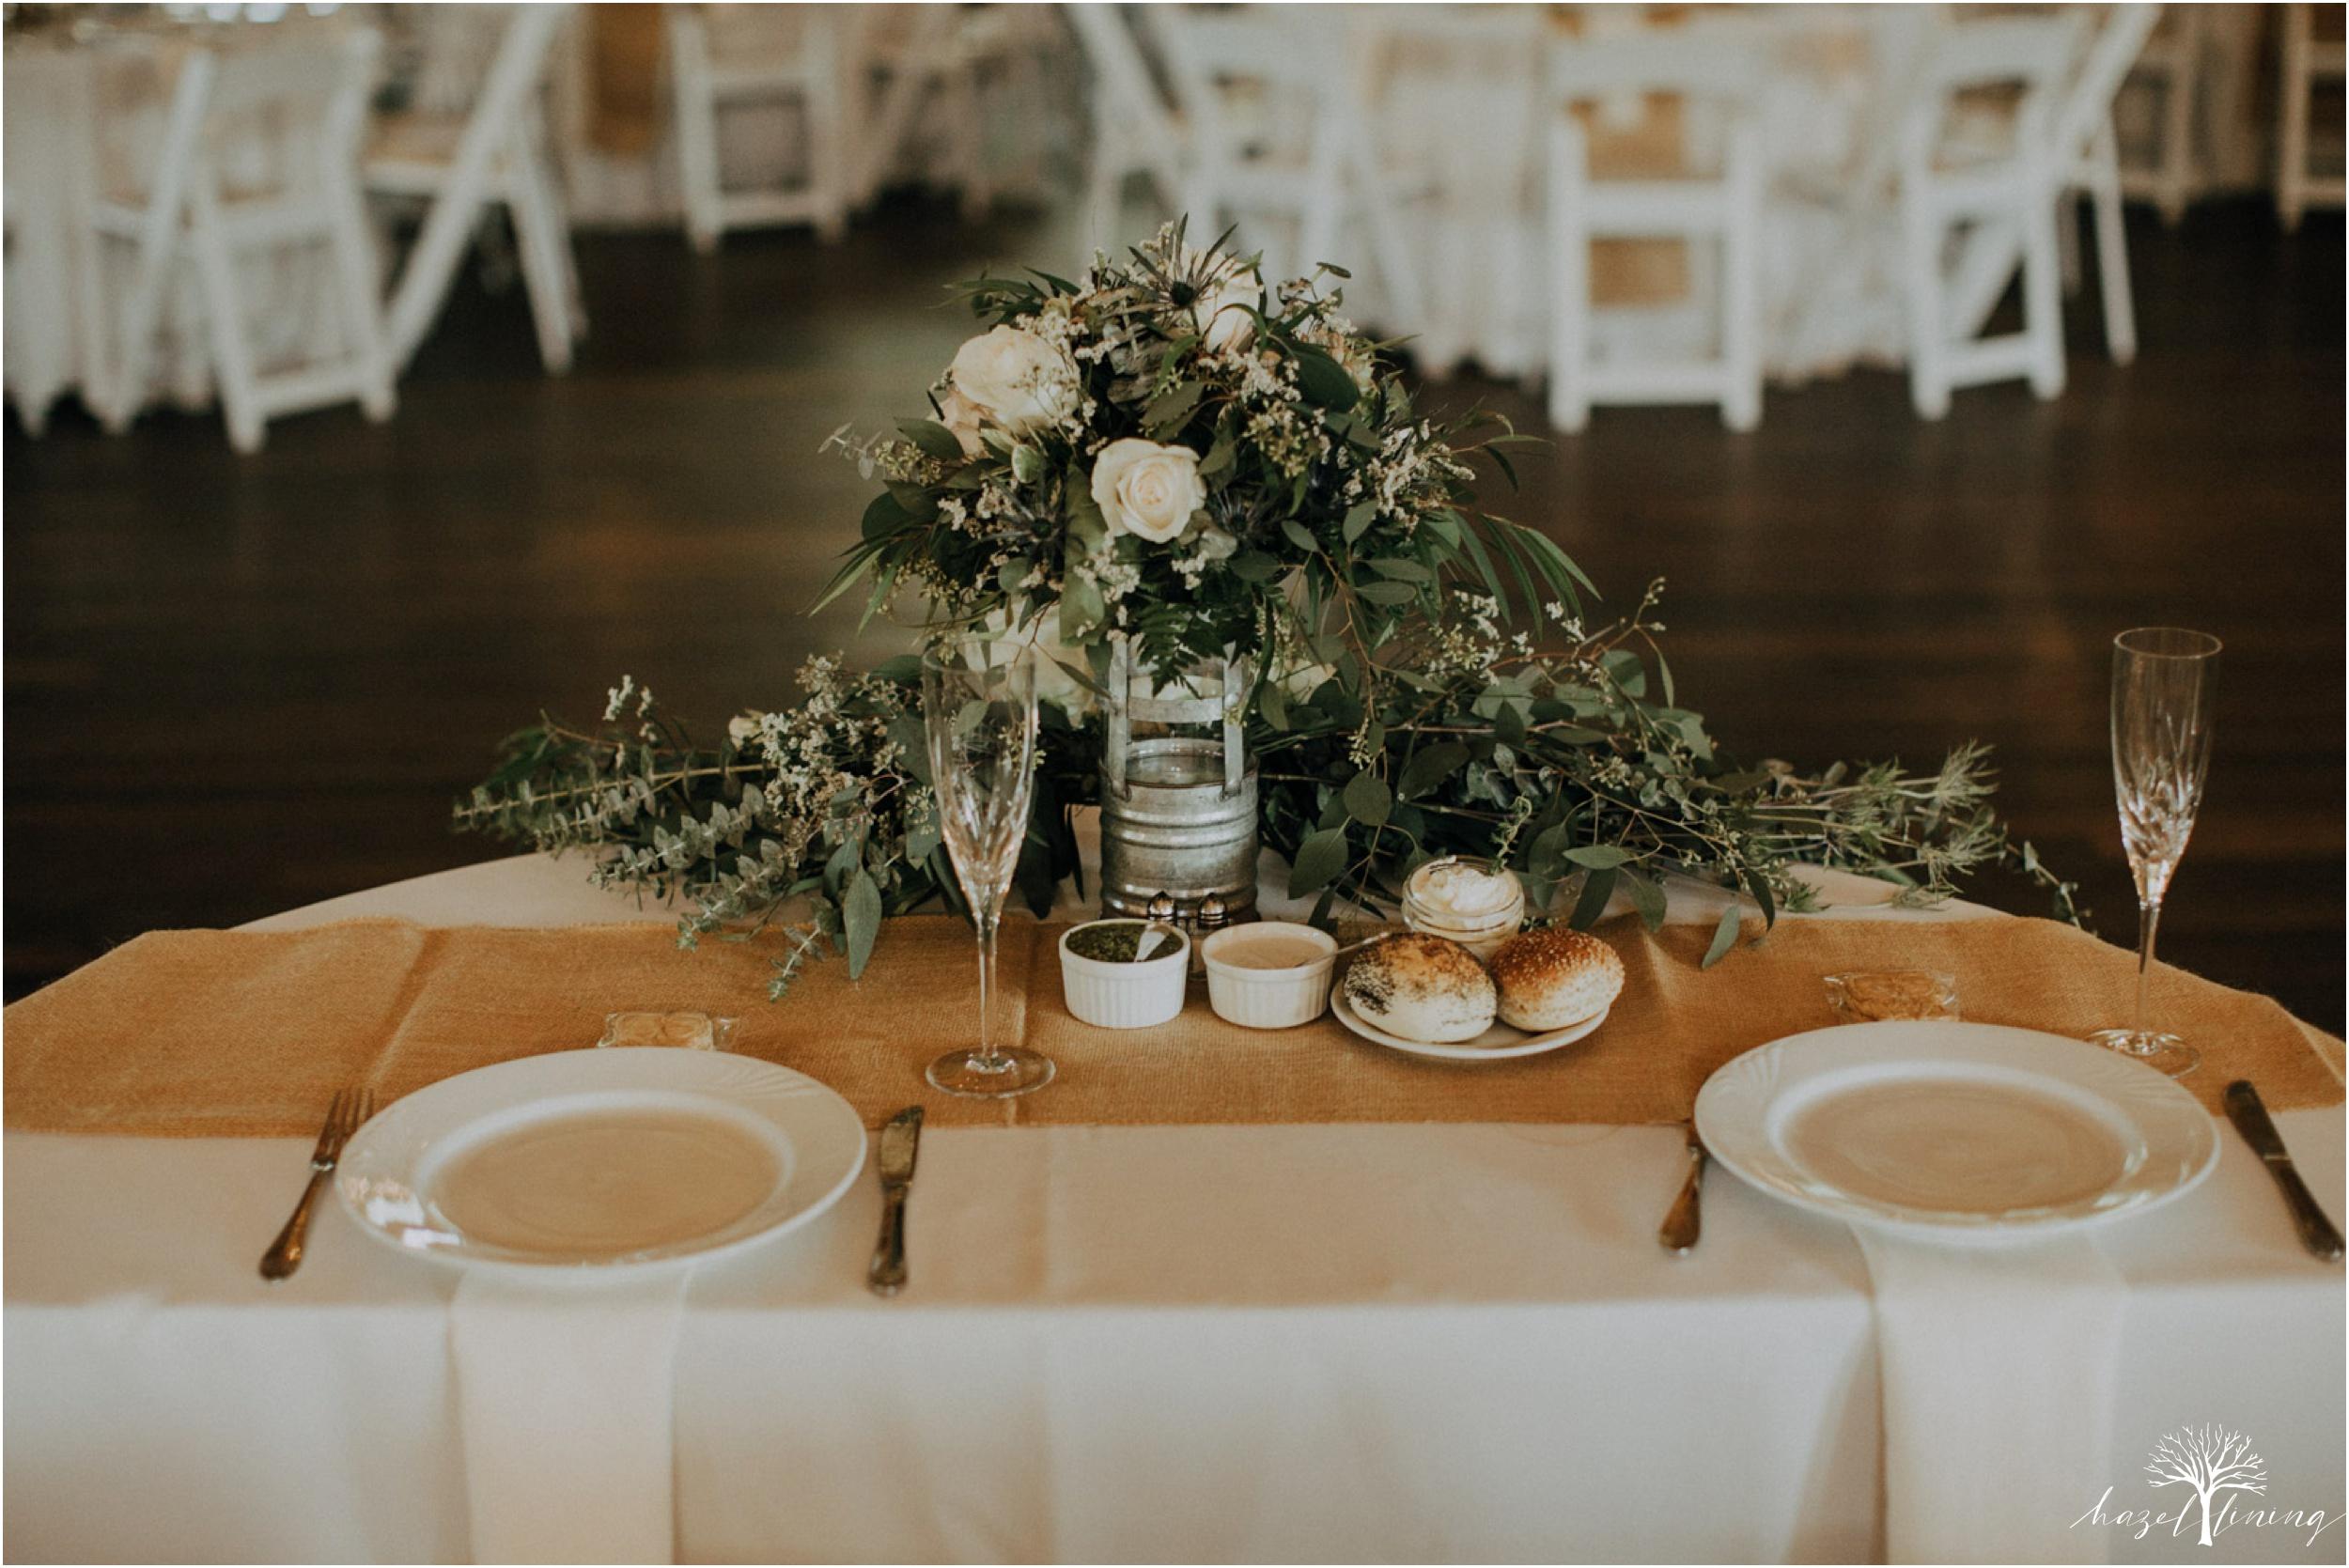 maureen-hepner-anthony-giordano-rose-bank-winery-newtow-pennsylvania-luxury-summer-wedding-hazel-lining-photography-destination-elopement-wedding-engagement-photography_0124.jpg